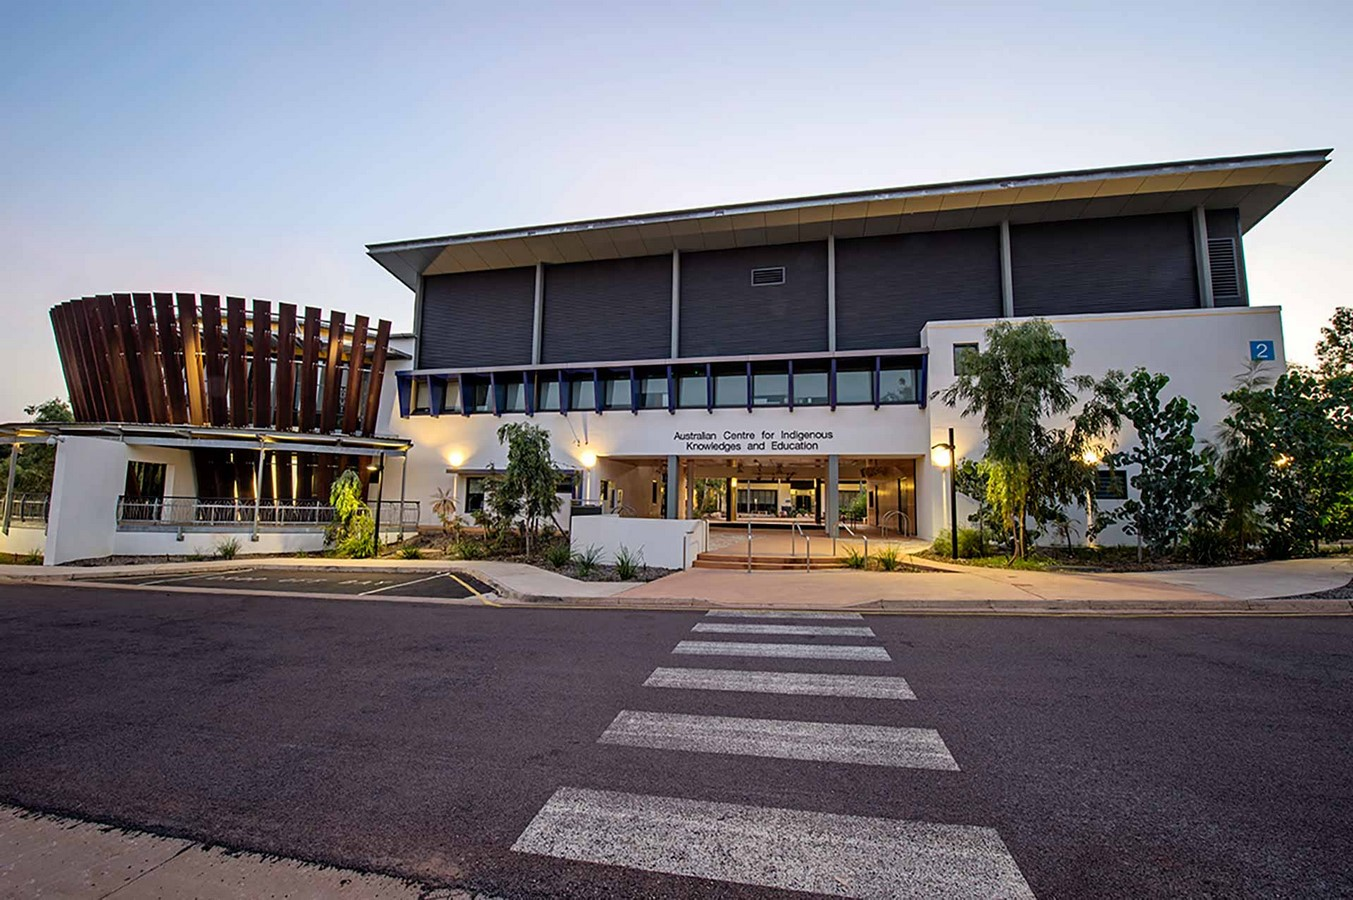 sustainable buildings - Australian Centre - sheet 1